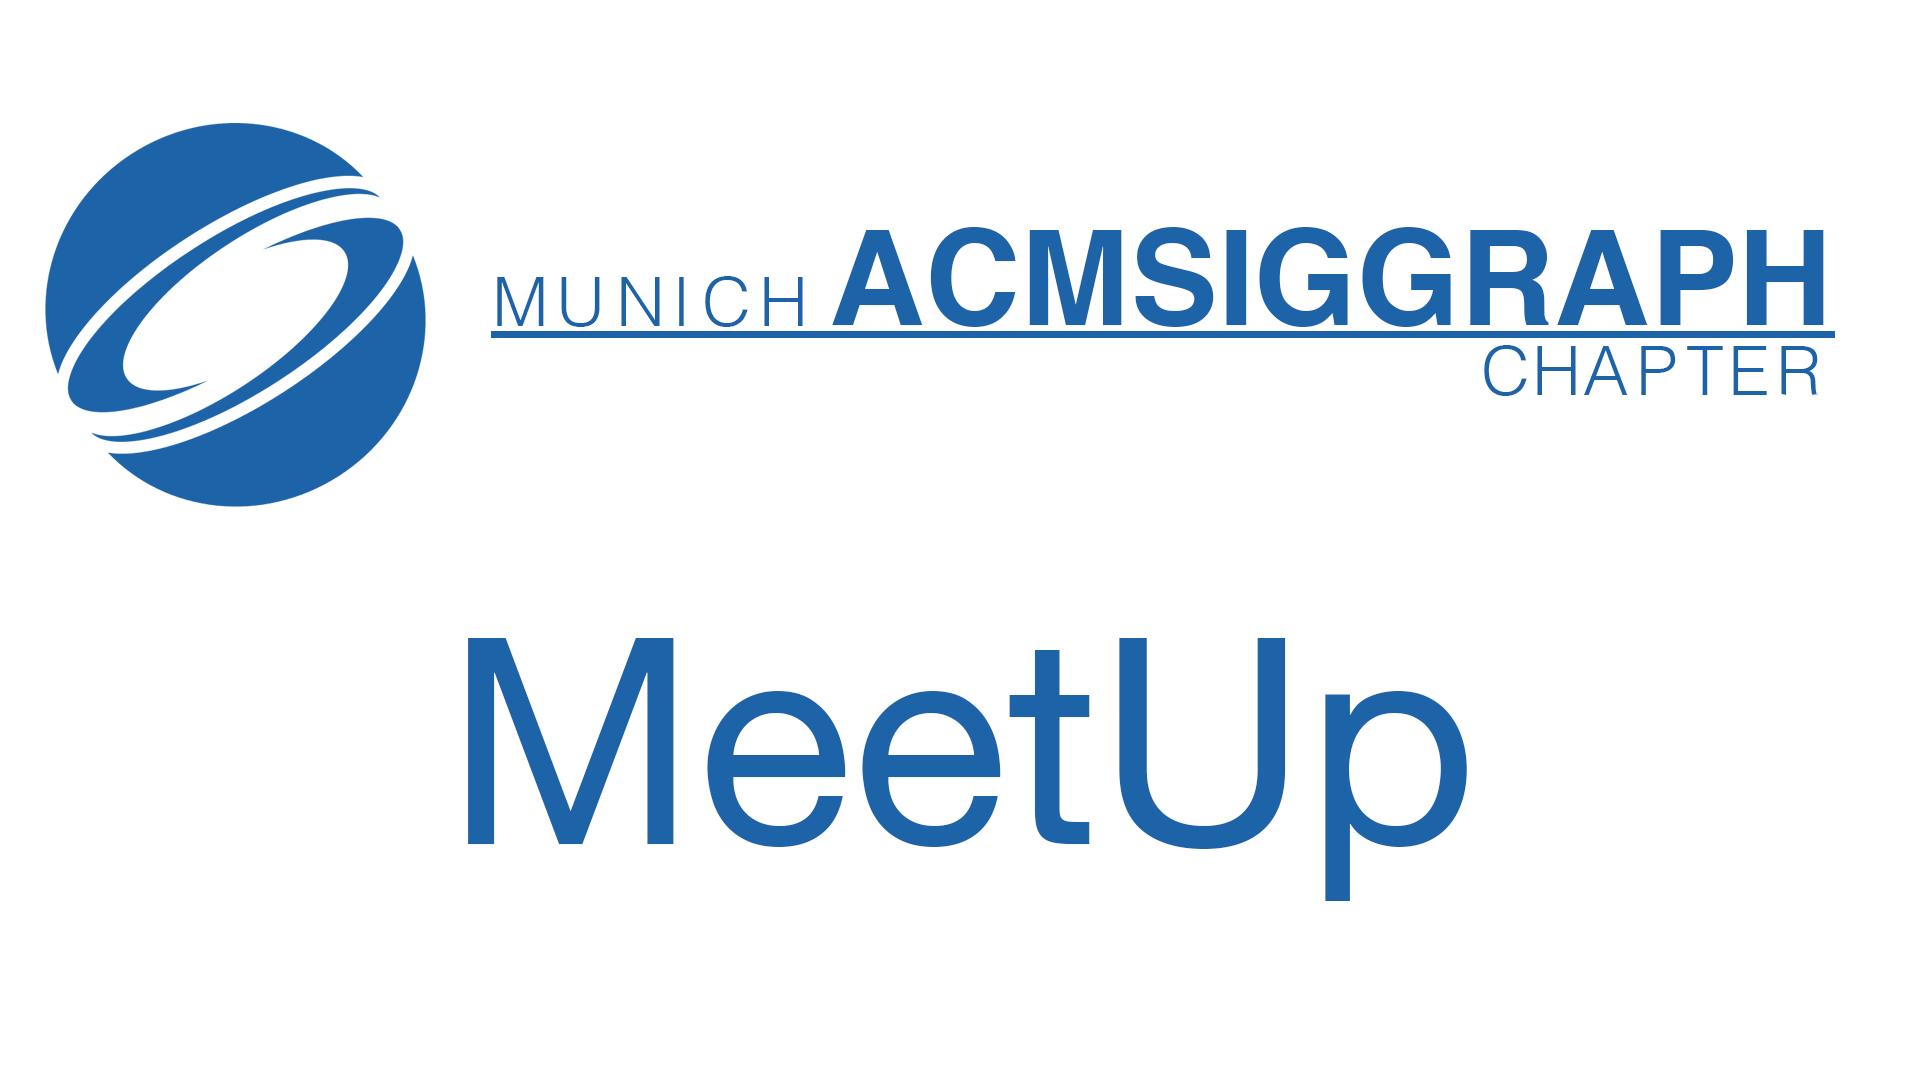 Munich ACM Siggraph MeetUp